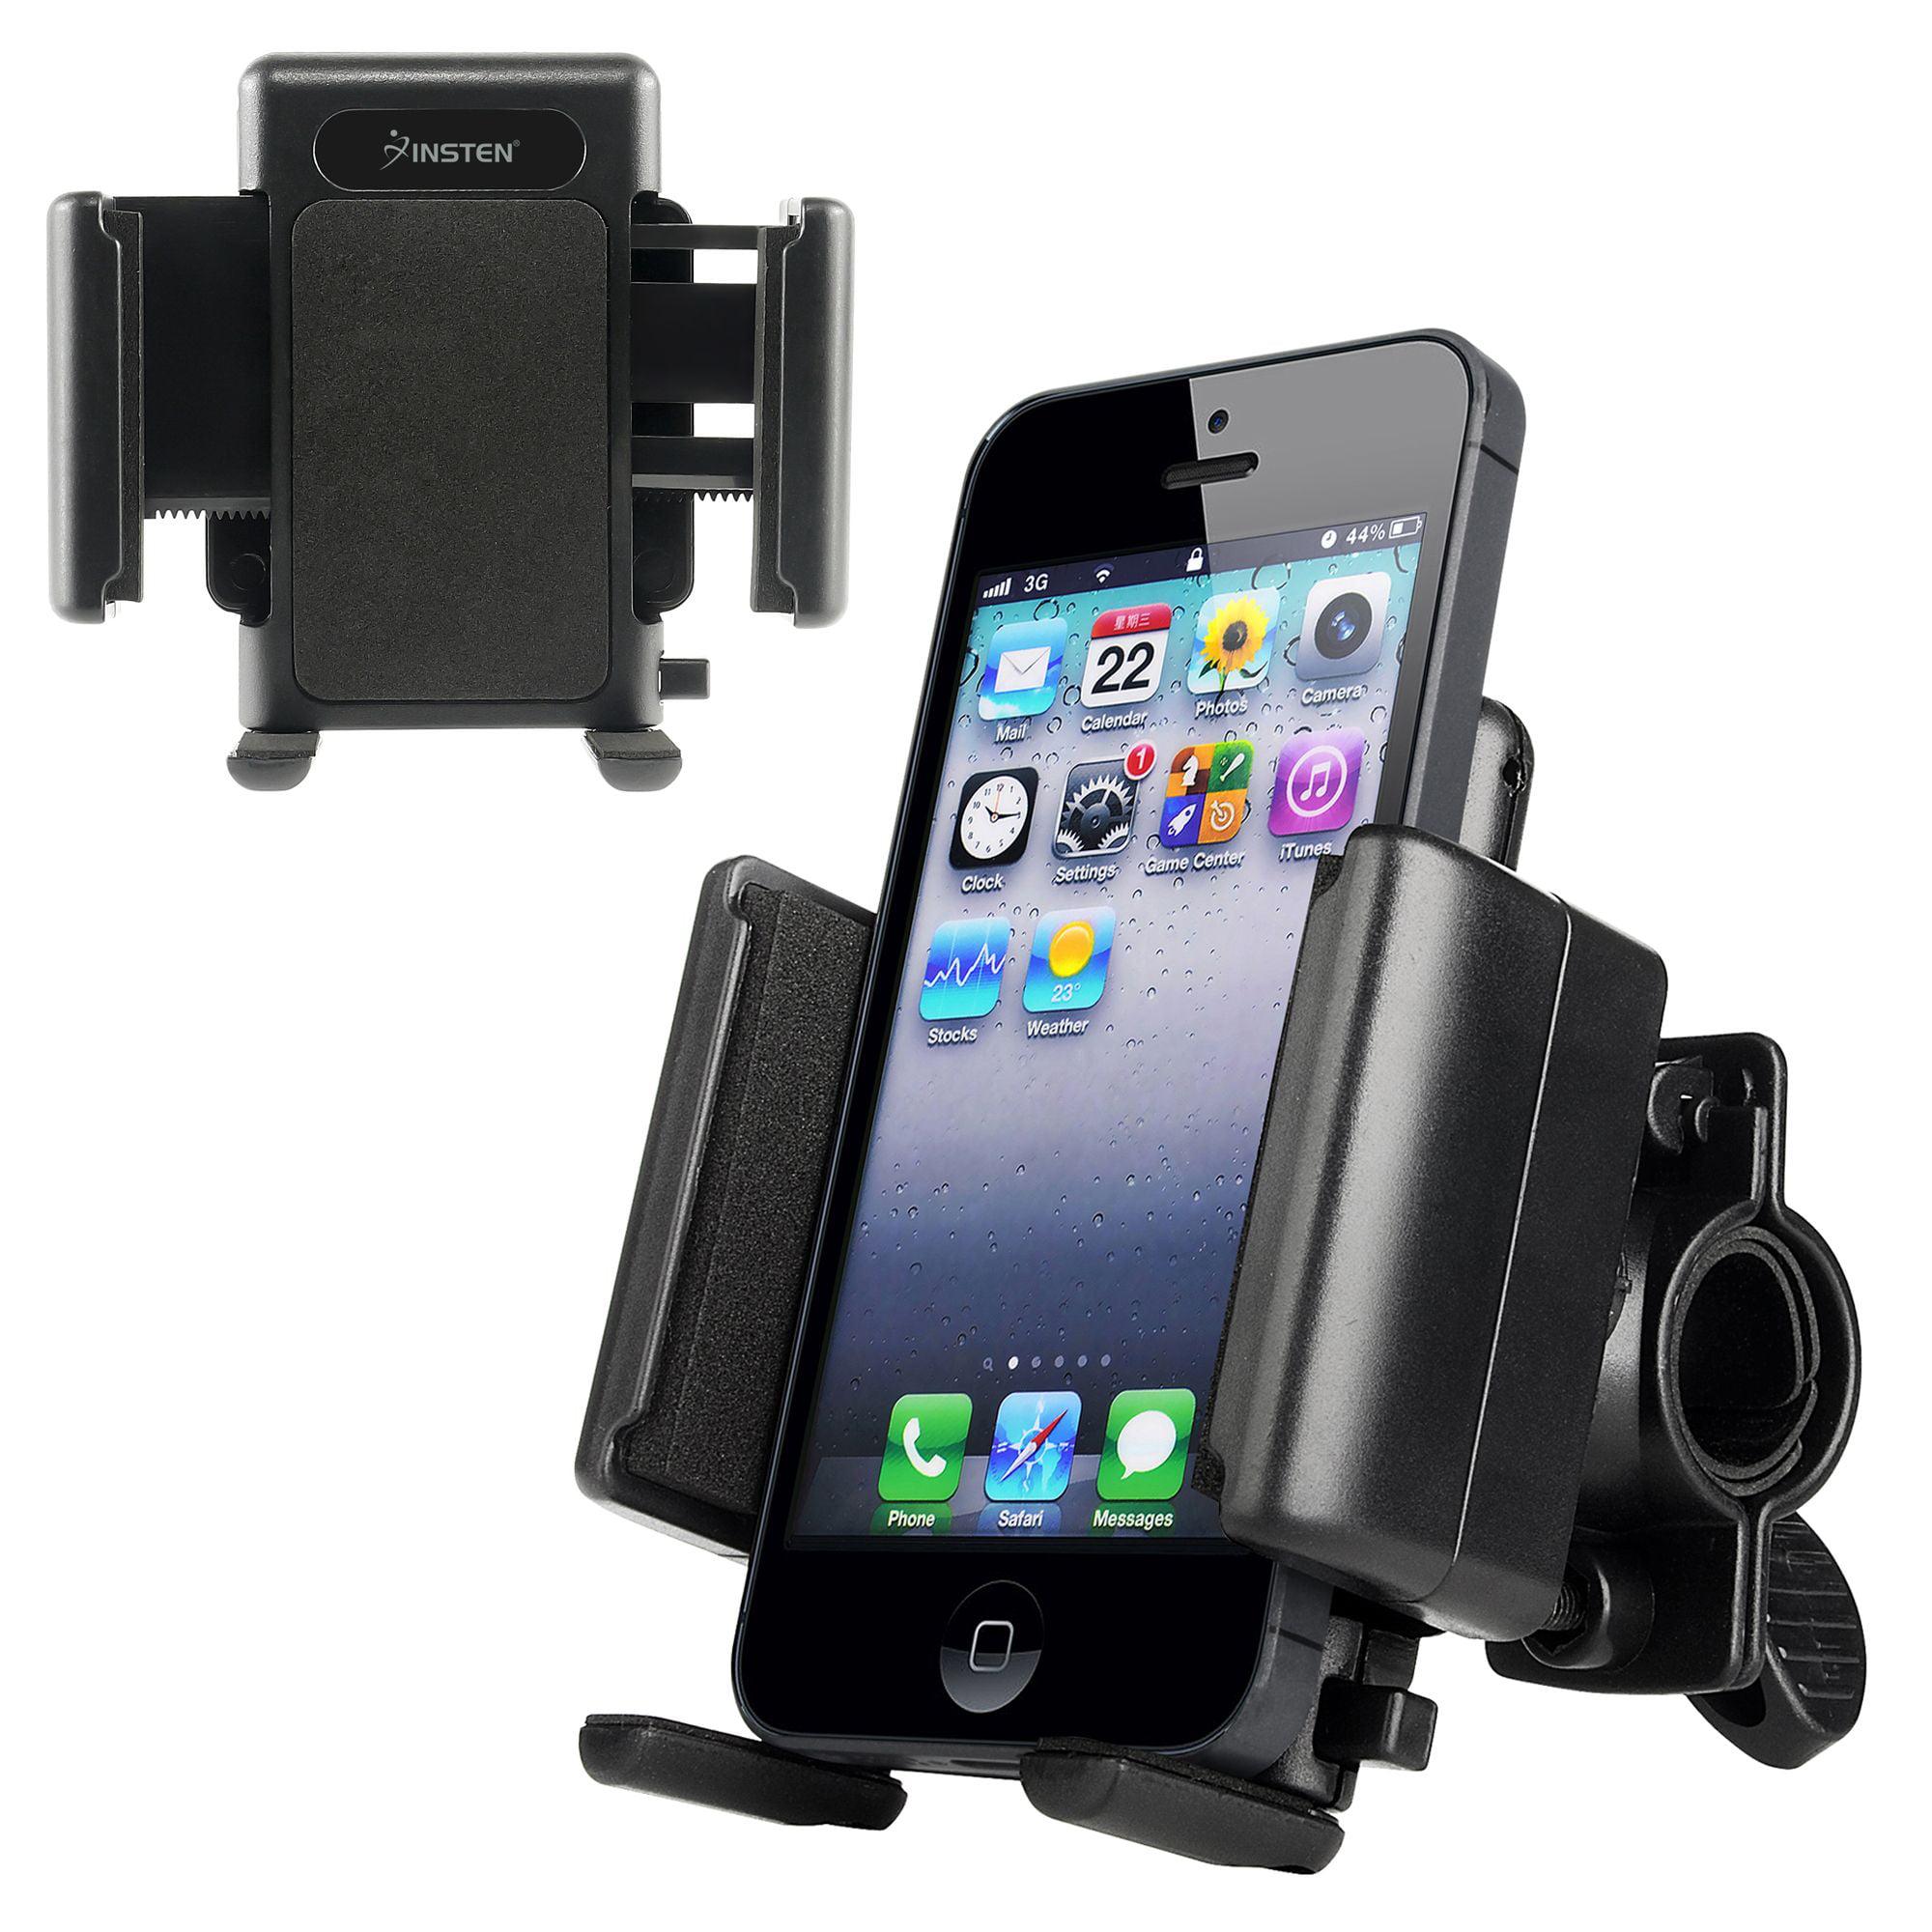 Insten Bike Bicycle Phone Holder Handlebar Bracket Mount for Smartphone iPhone XS X 8 7 6 Plus 6S SE/ Samsung Galaxy S9 S8 Note 8/ Moto E4 G5 G4 Z Play Droid E G X/ LG K20 Stylo 3 Adjustable Universal